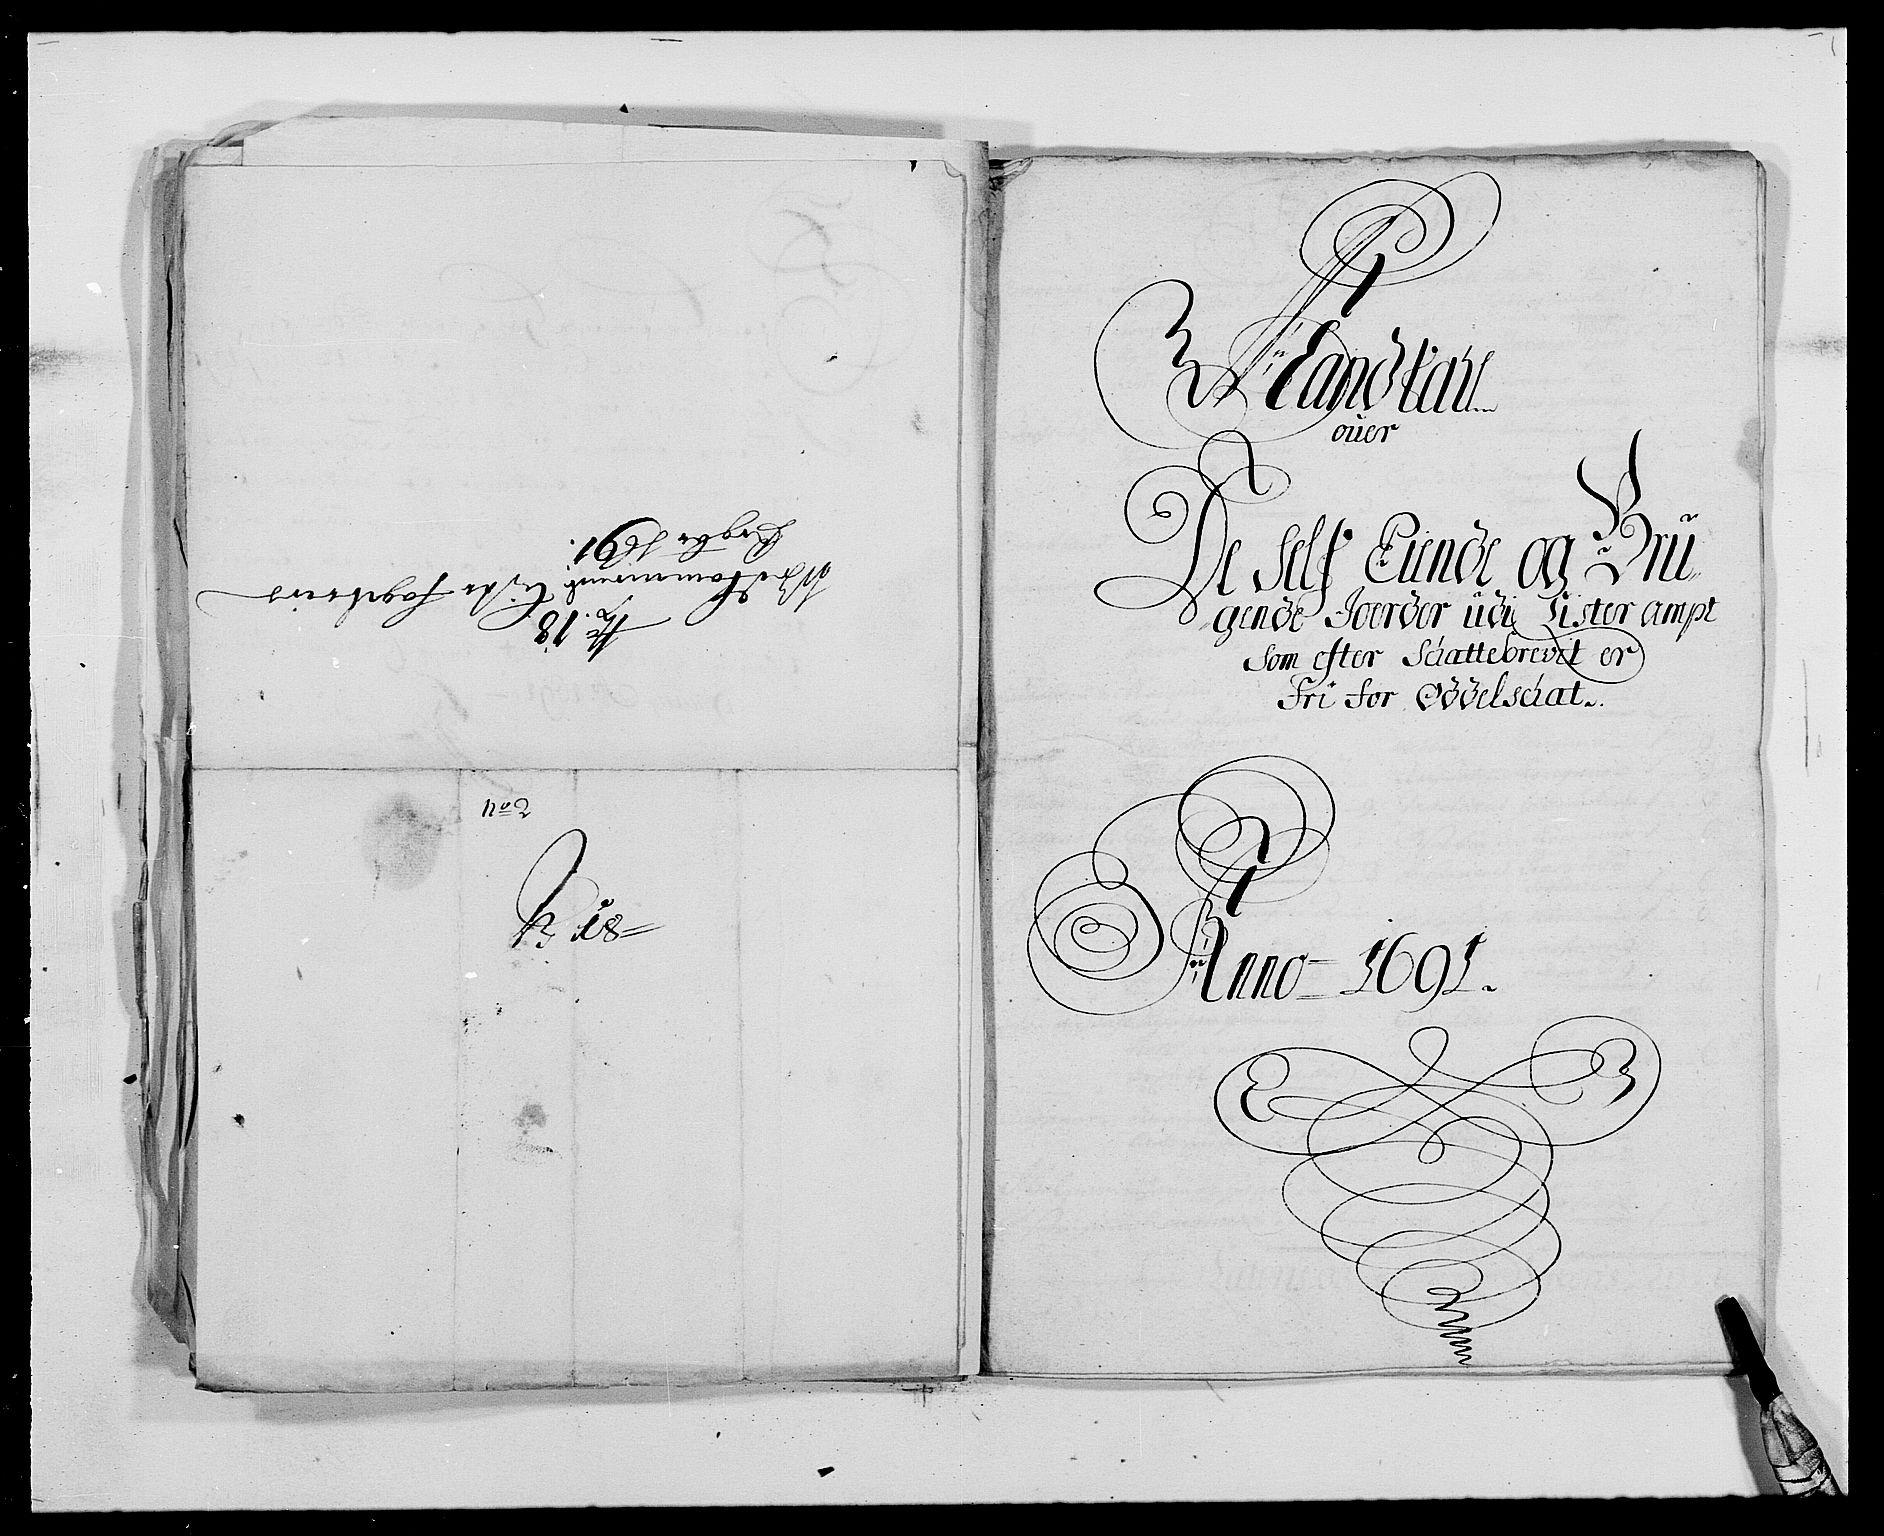 RA, Rentekammeret inntil 1814, Reviderte regnskaper, Fogderegnskap, R41/L2536: Fogderegnskap Lista, 1690-1693, s. 177